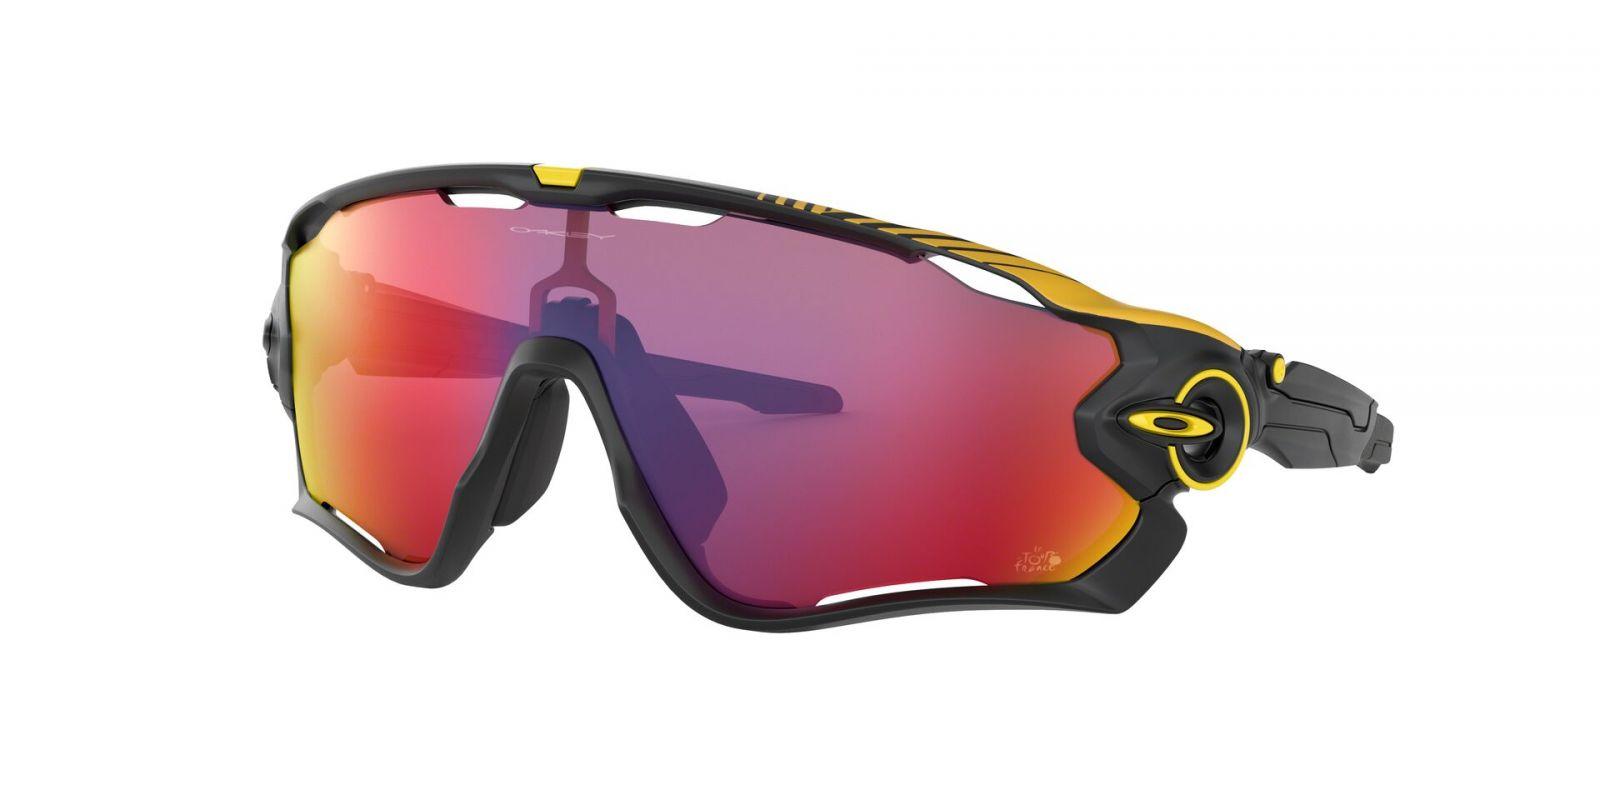 Brýle OAKLEY Jawbreaker - TdeF Tour de France 2019 Matte Black w/Prizm Road